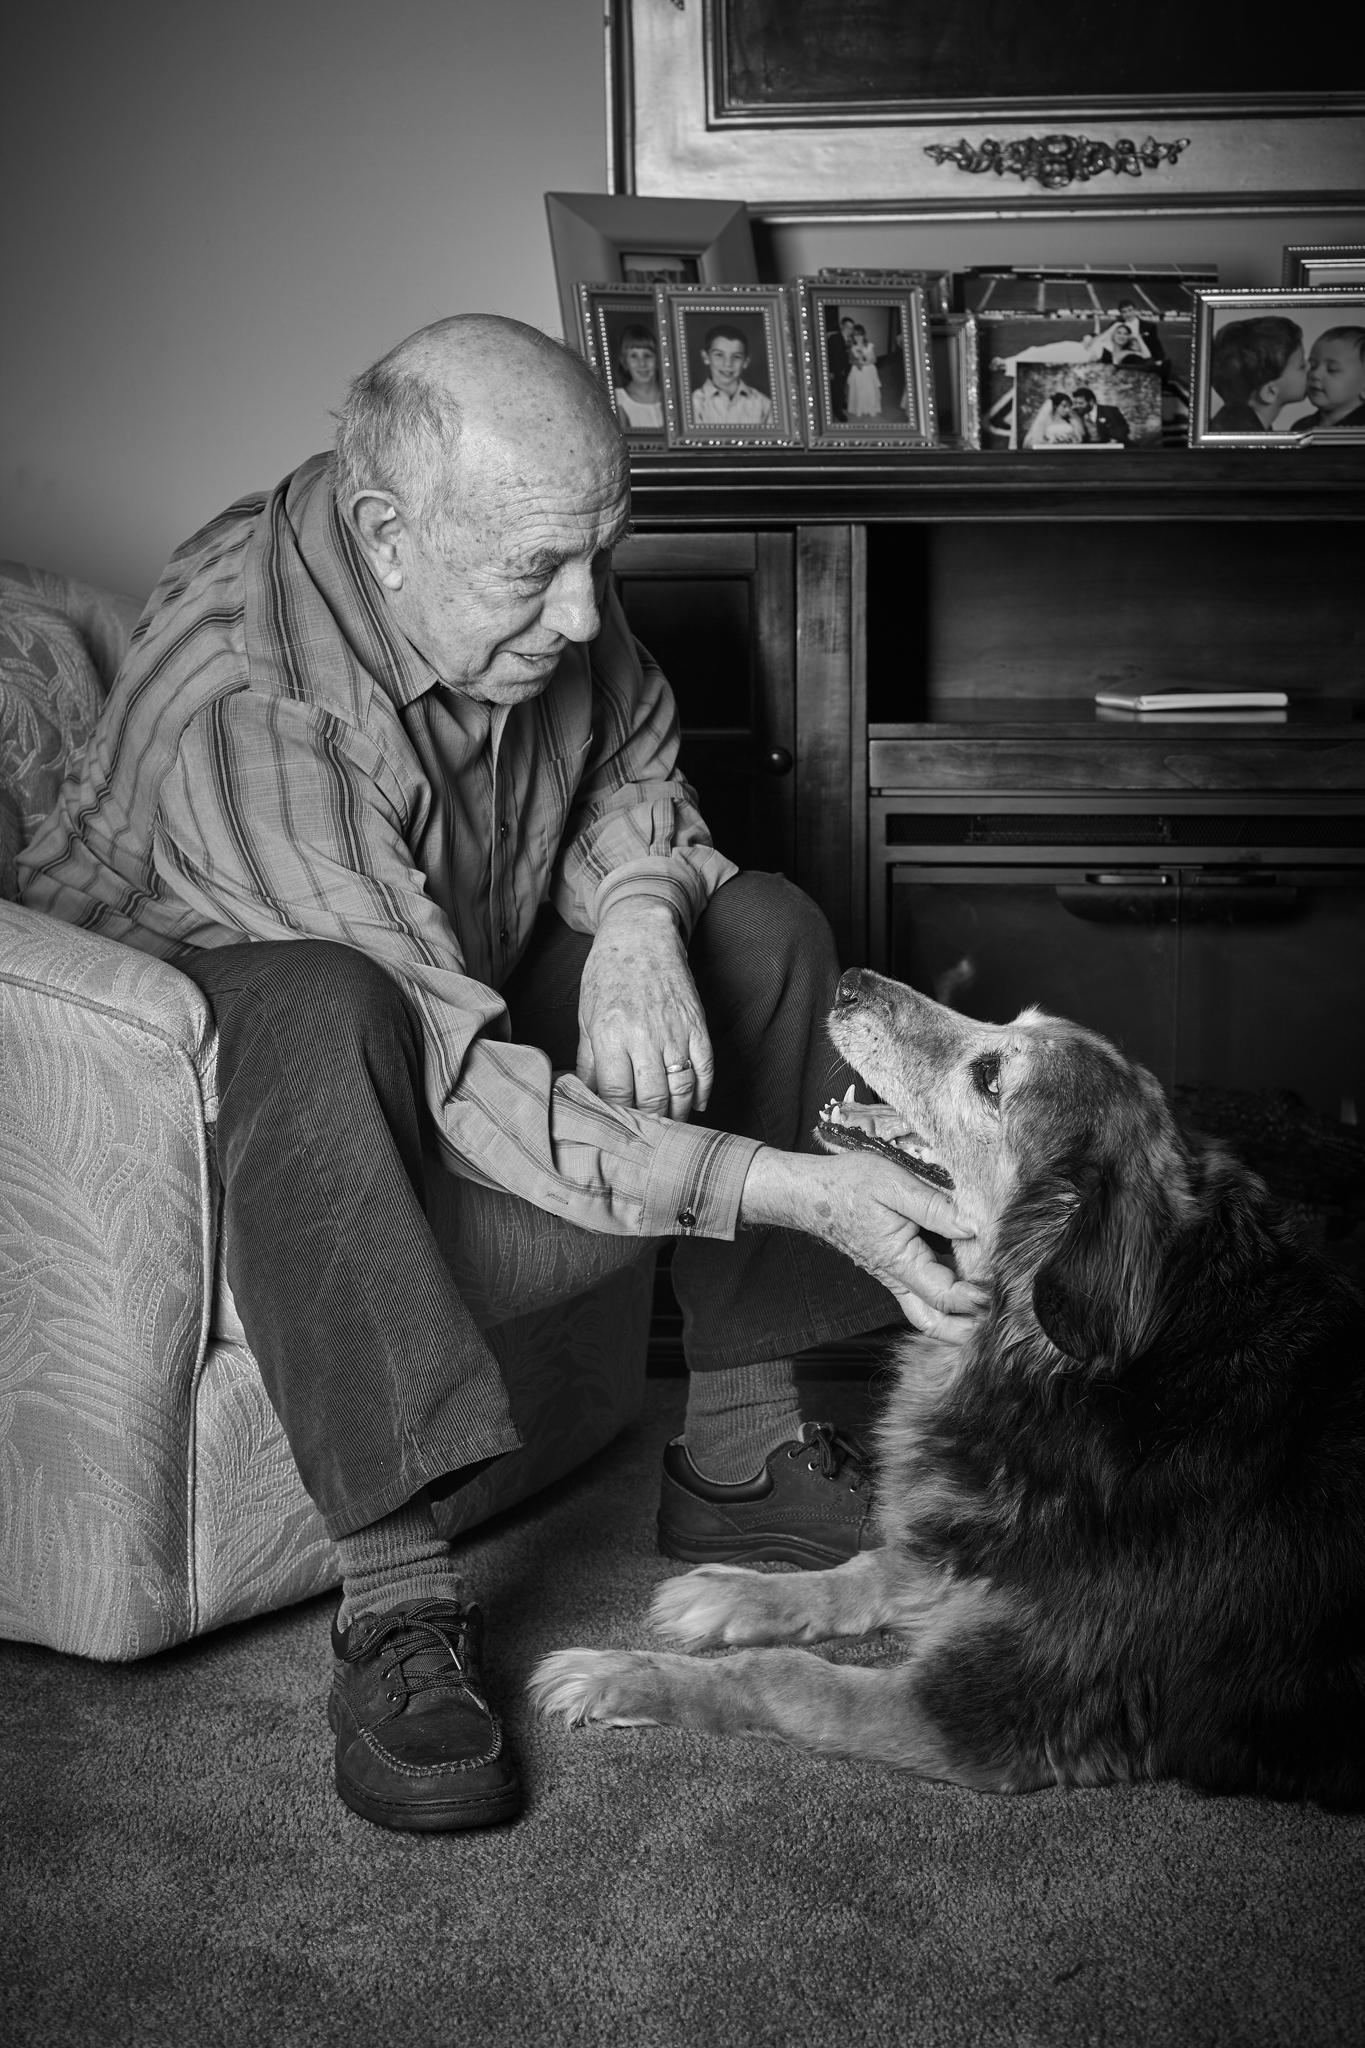 boprey-pet-photography-portrait-nyc_2.jpg